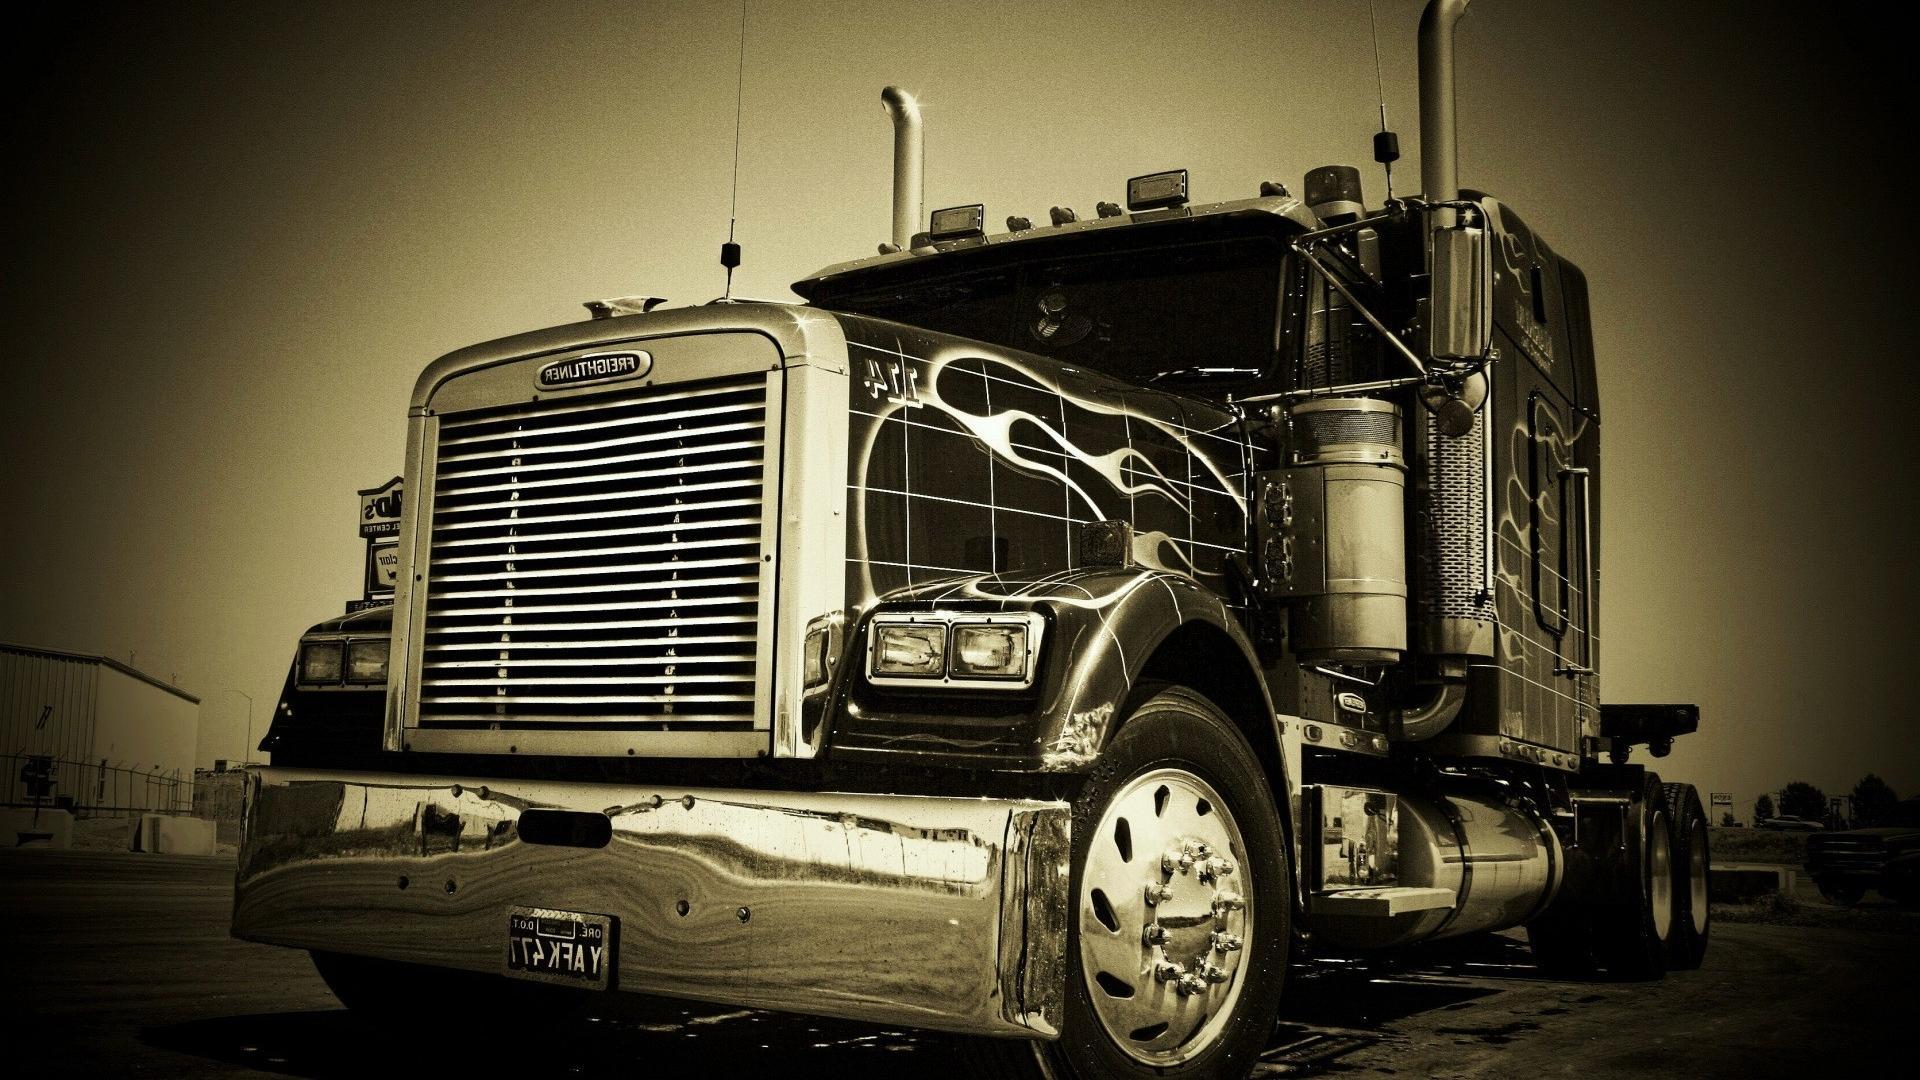 18 wheeler semi trucks wallpaper 111058 1920x1080